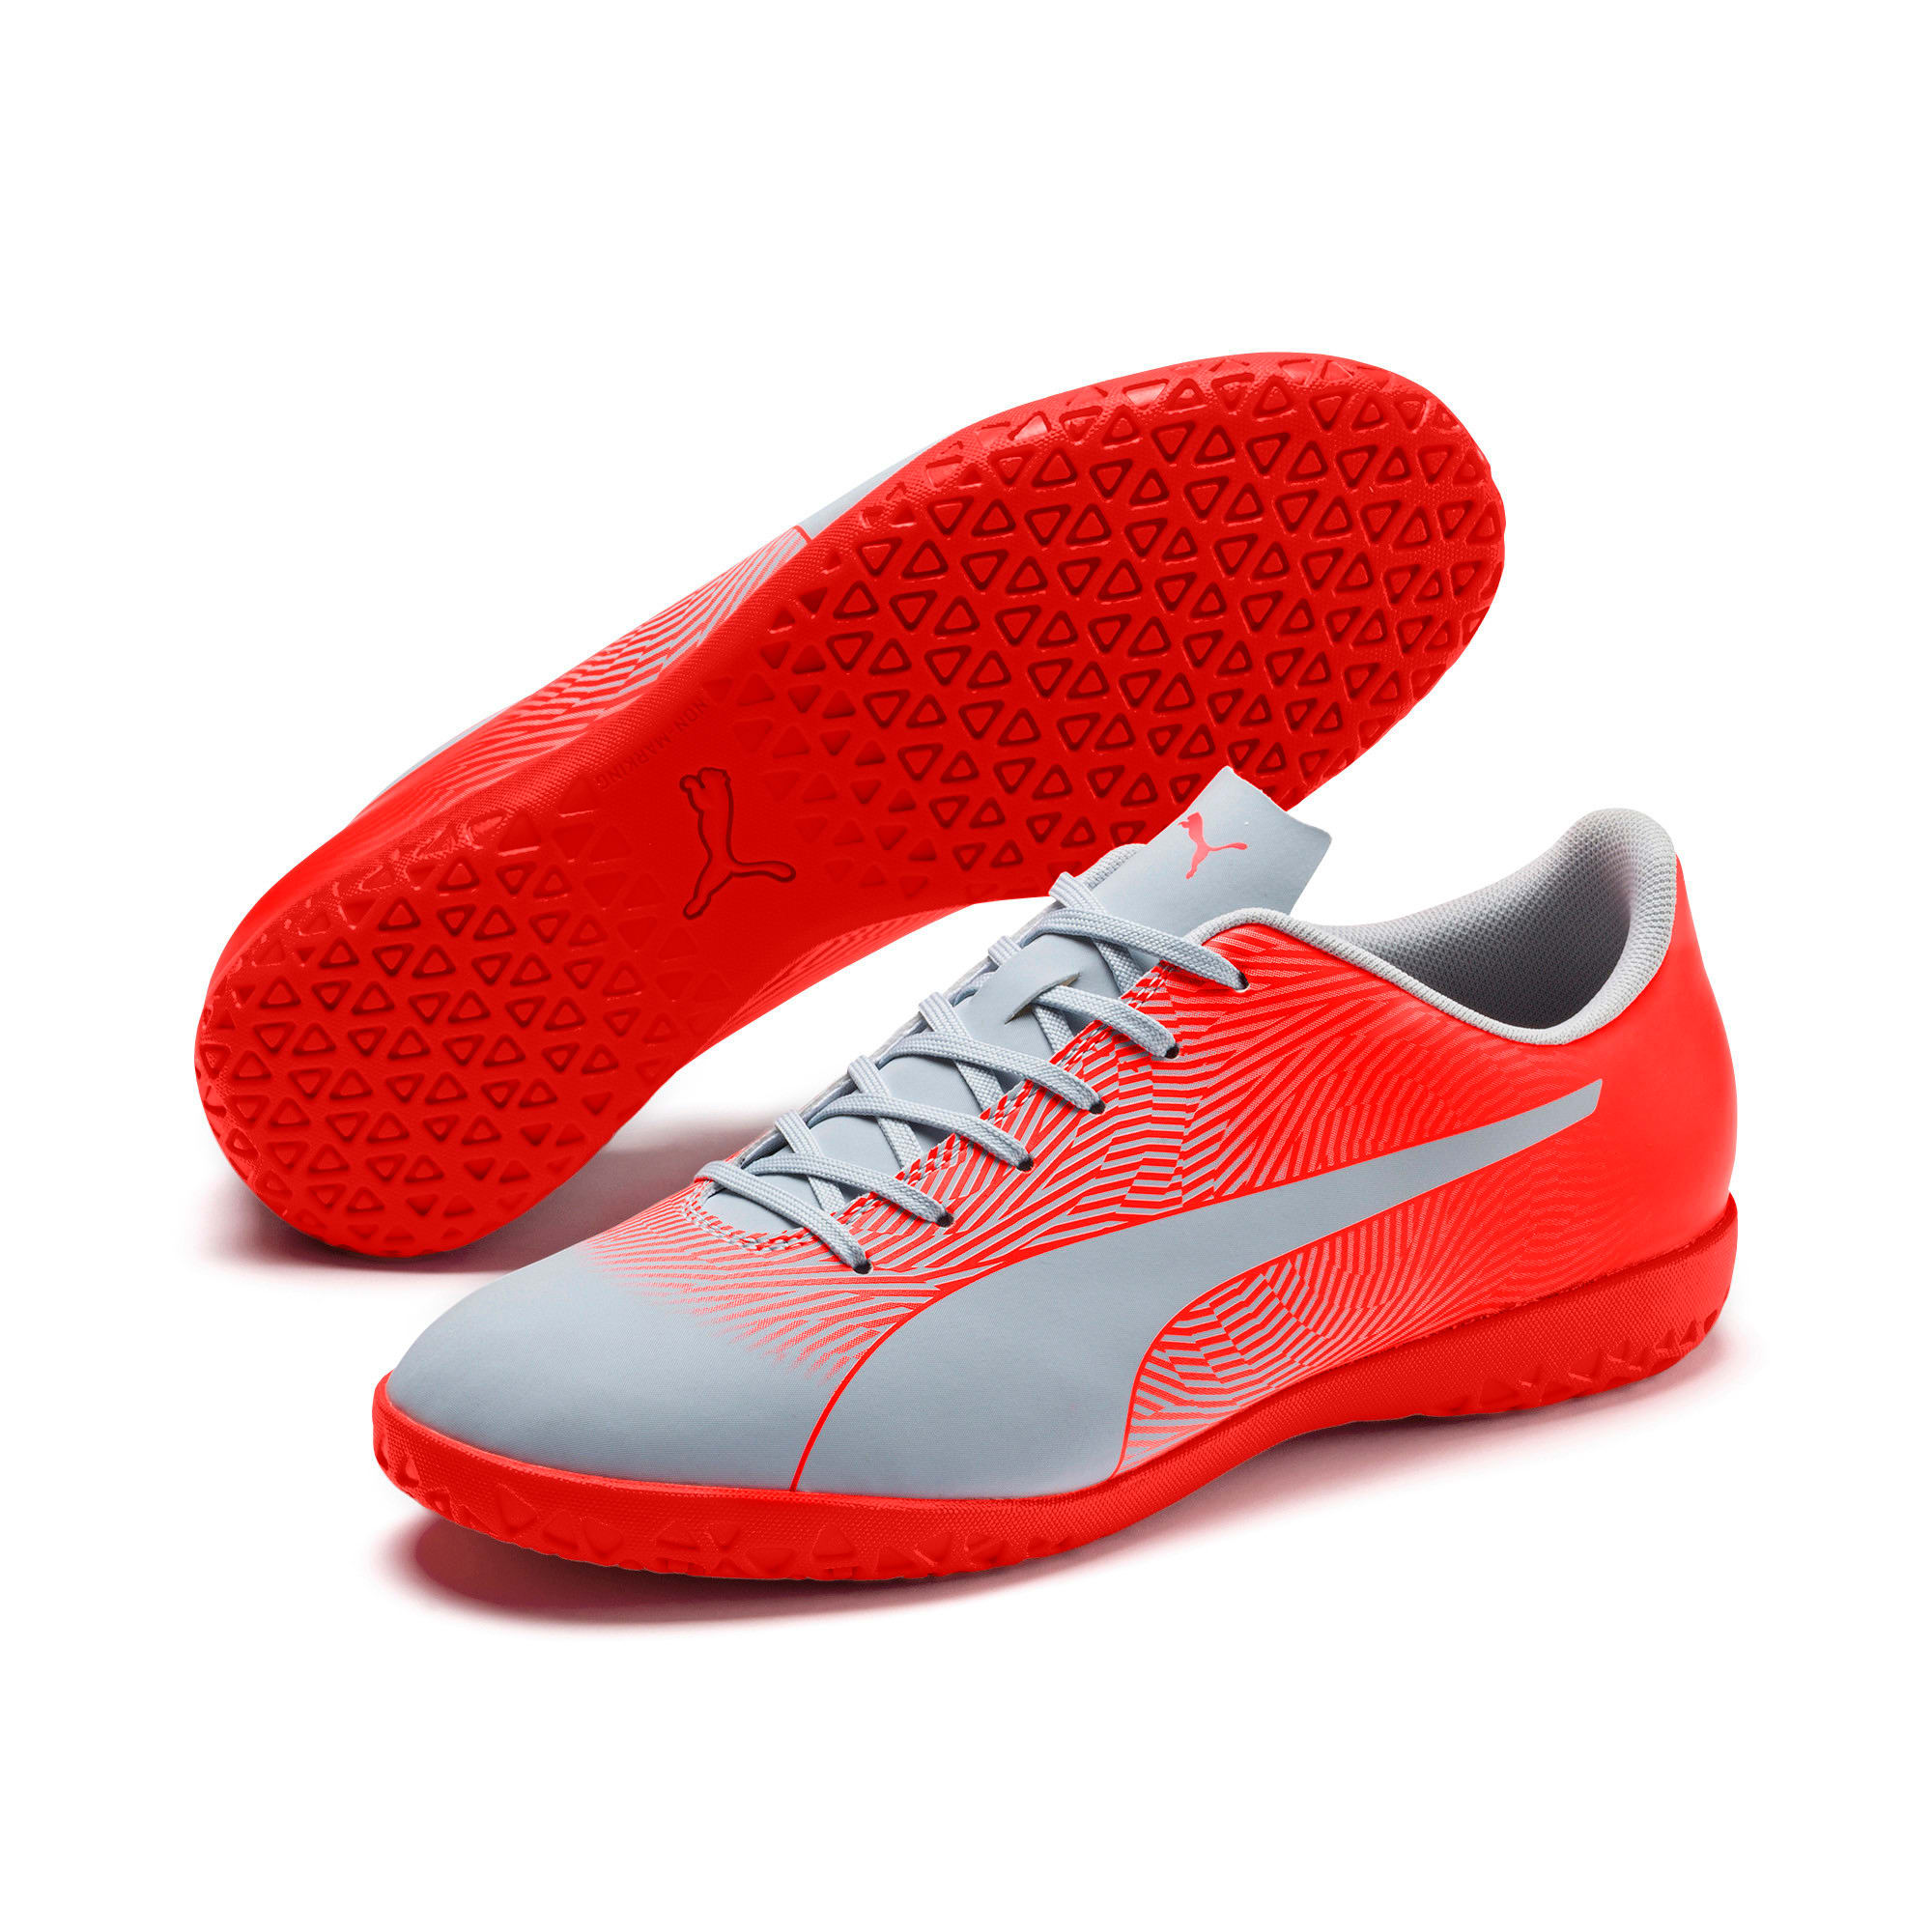 Thumbnail 2 of PUMA Spirit II IT Men's Soccer Shoes, Glacial Blue-Nrgy Red, medium